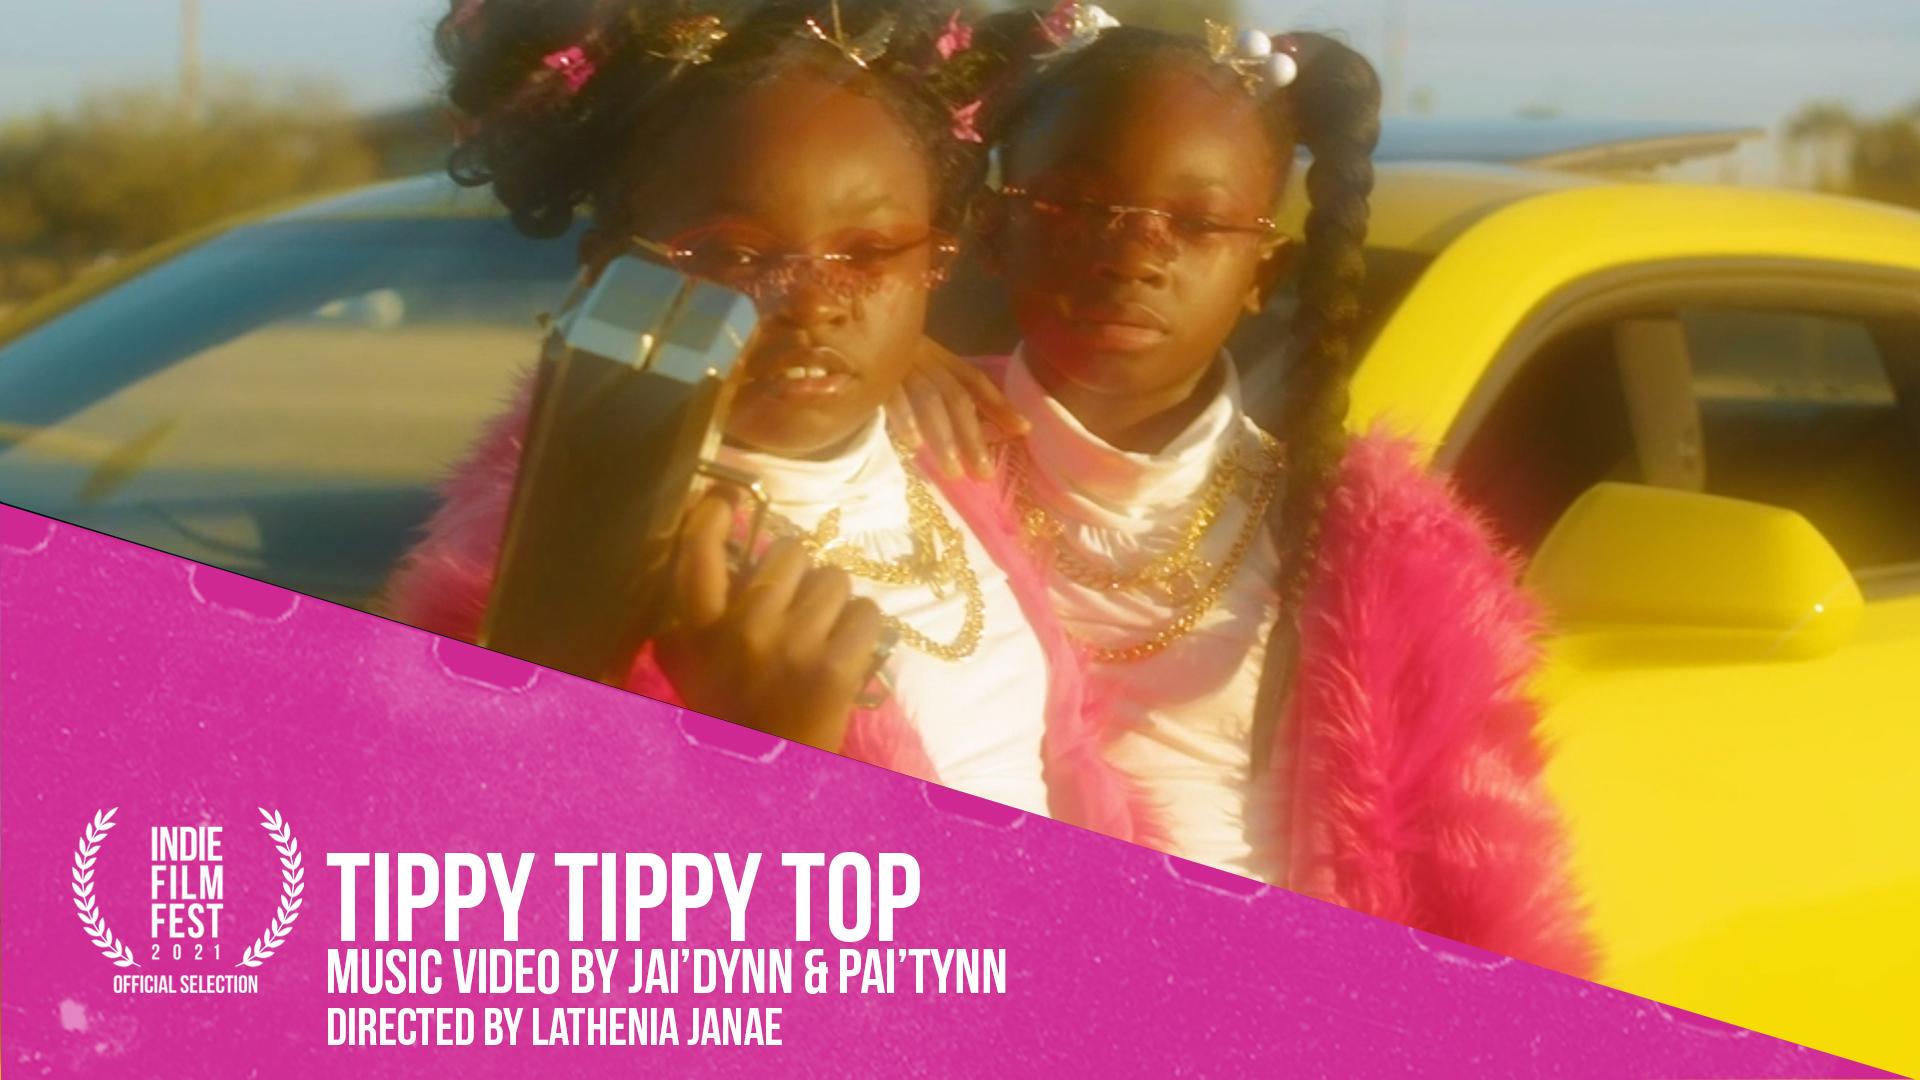 Tippytippytop-os